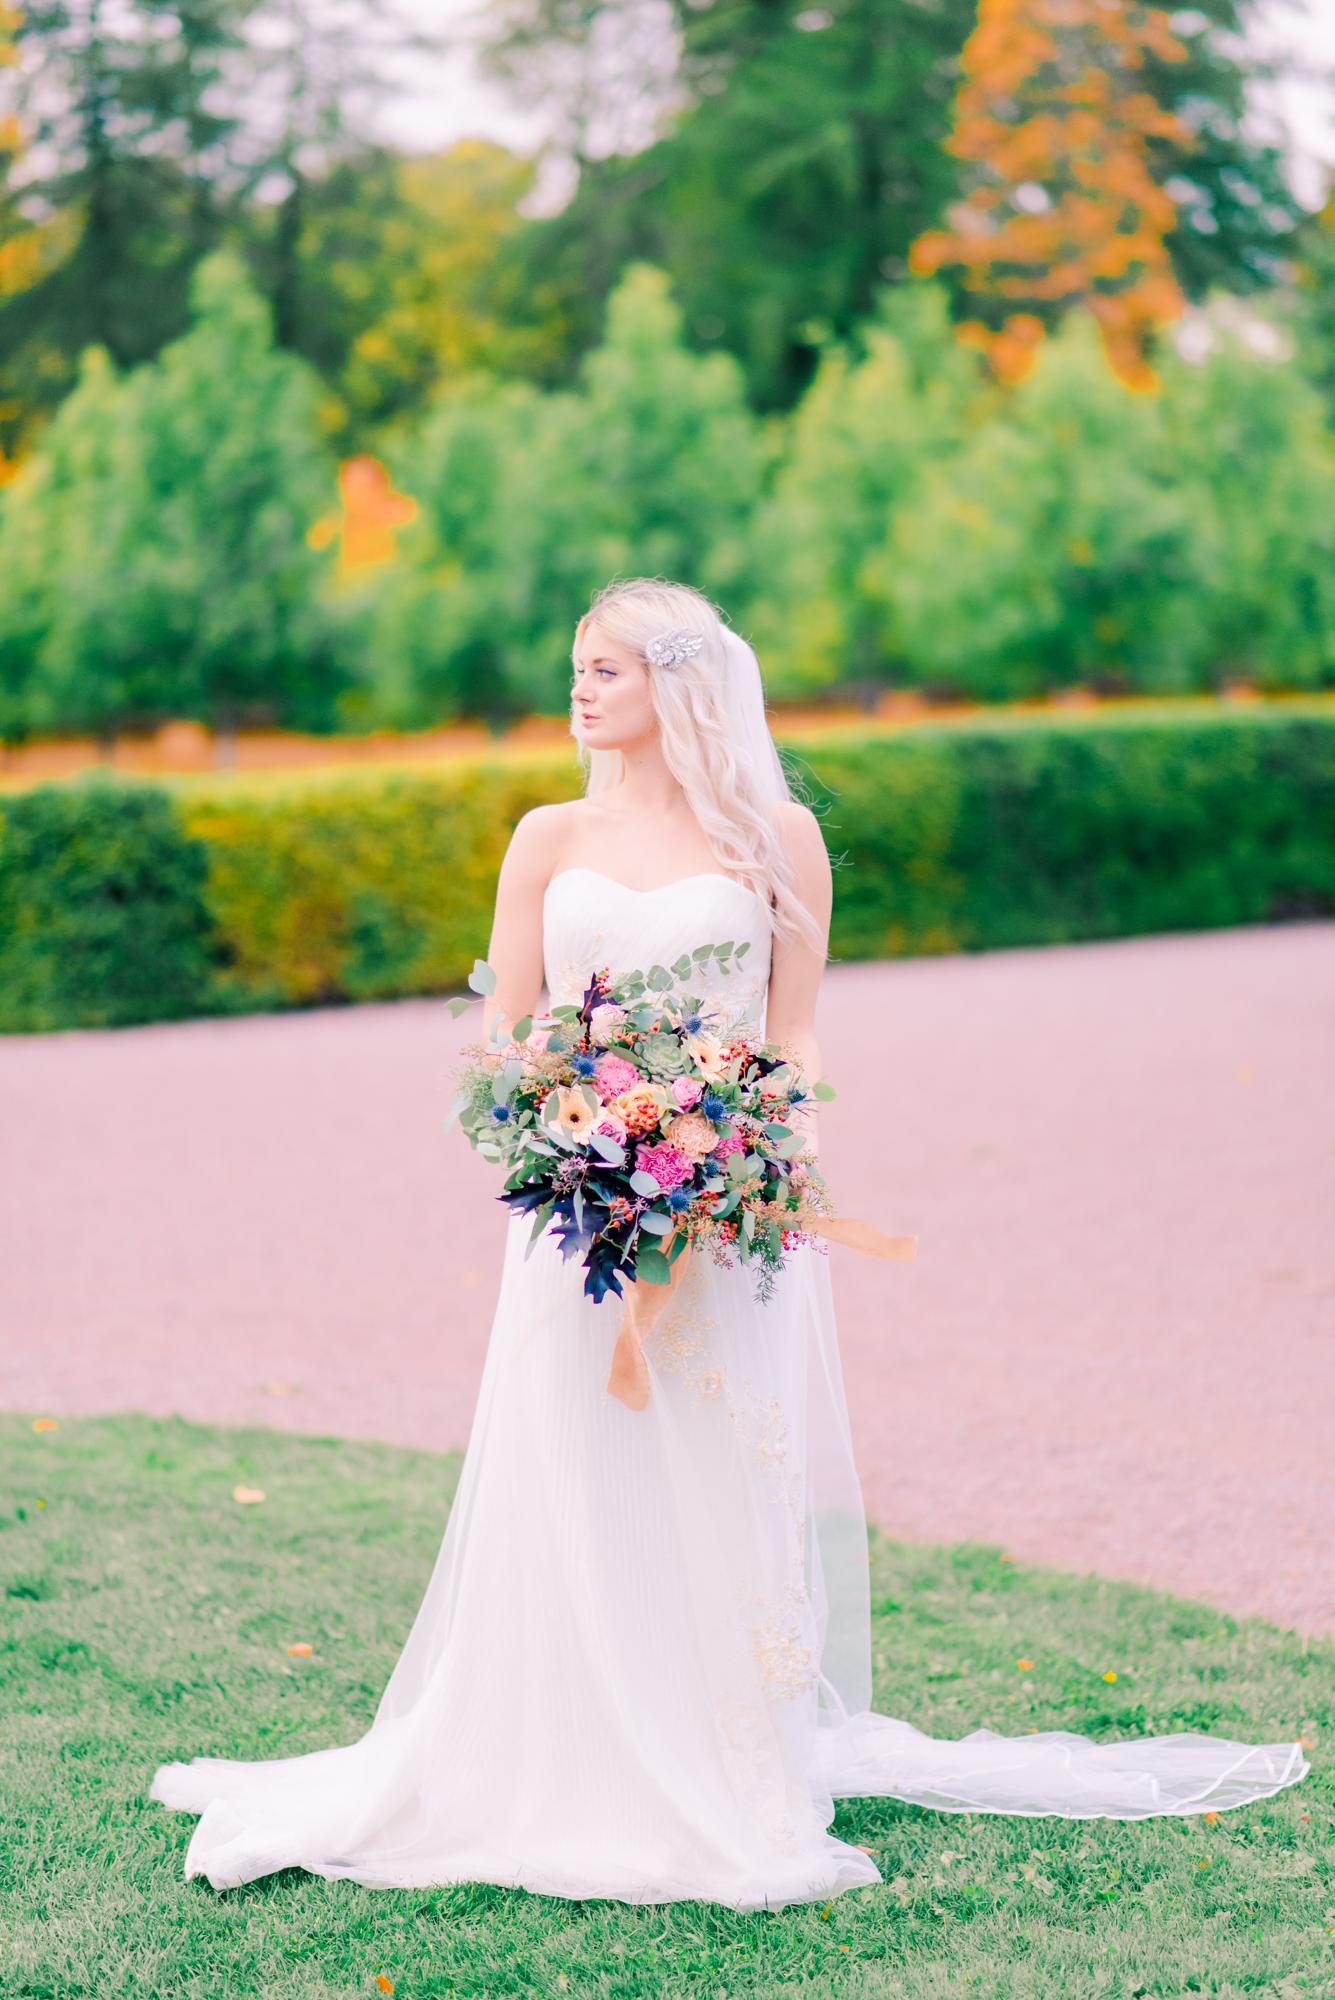 Elegant Organic Fall Swedish Bridal Wedding Styled Shoot - Erika Alvarenga Photography-43.jpg